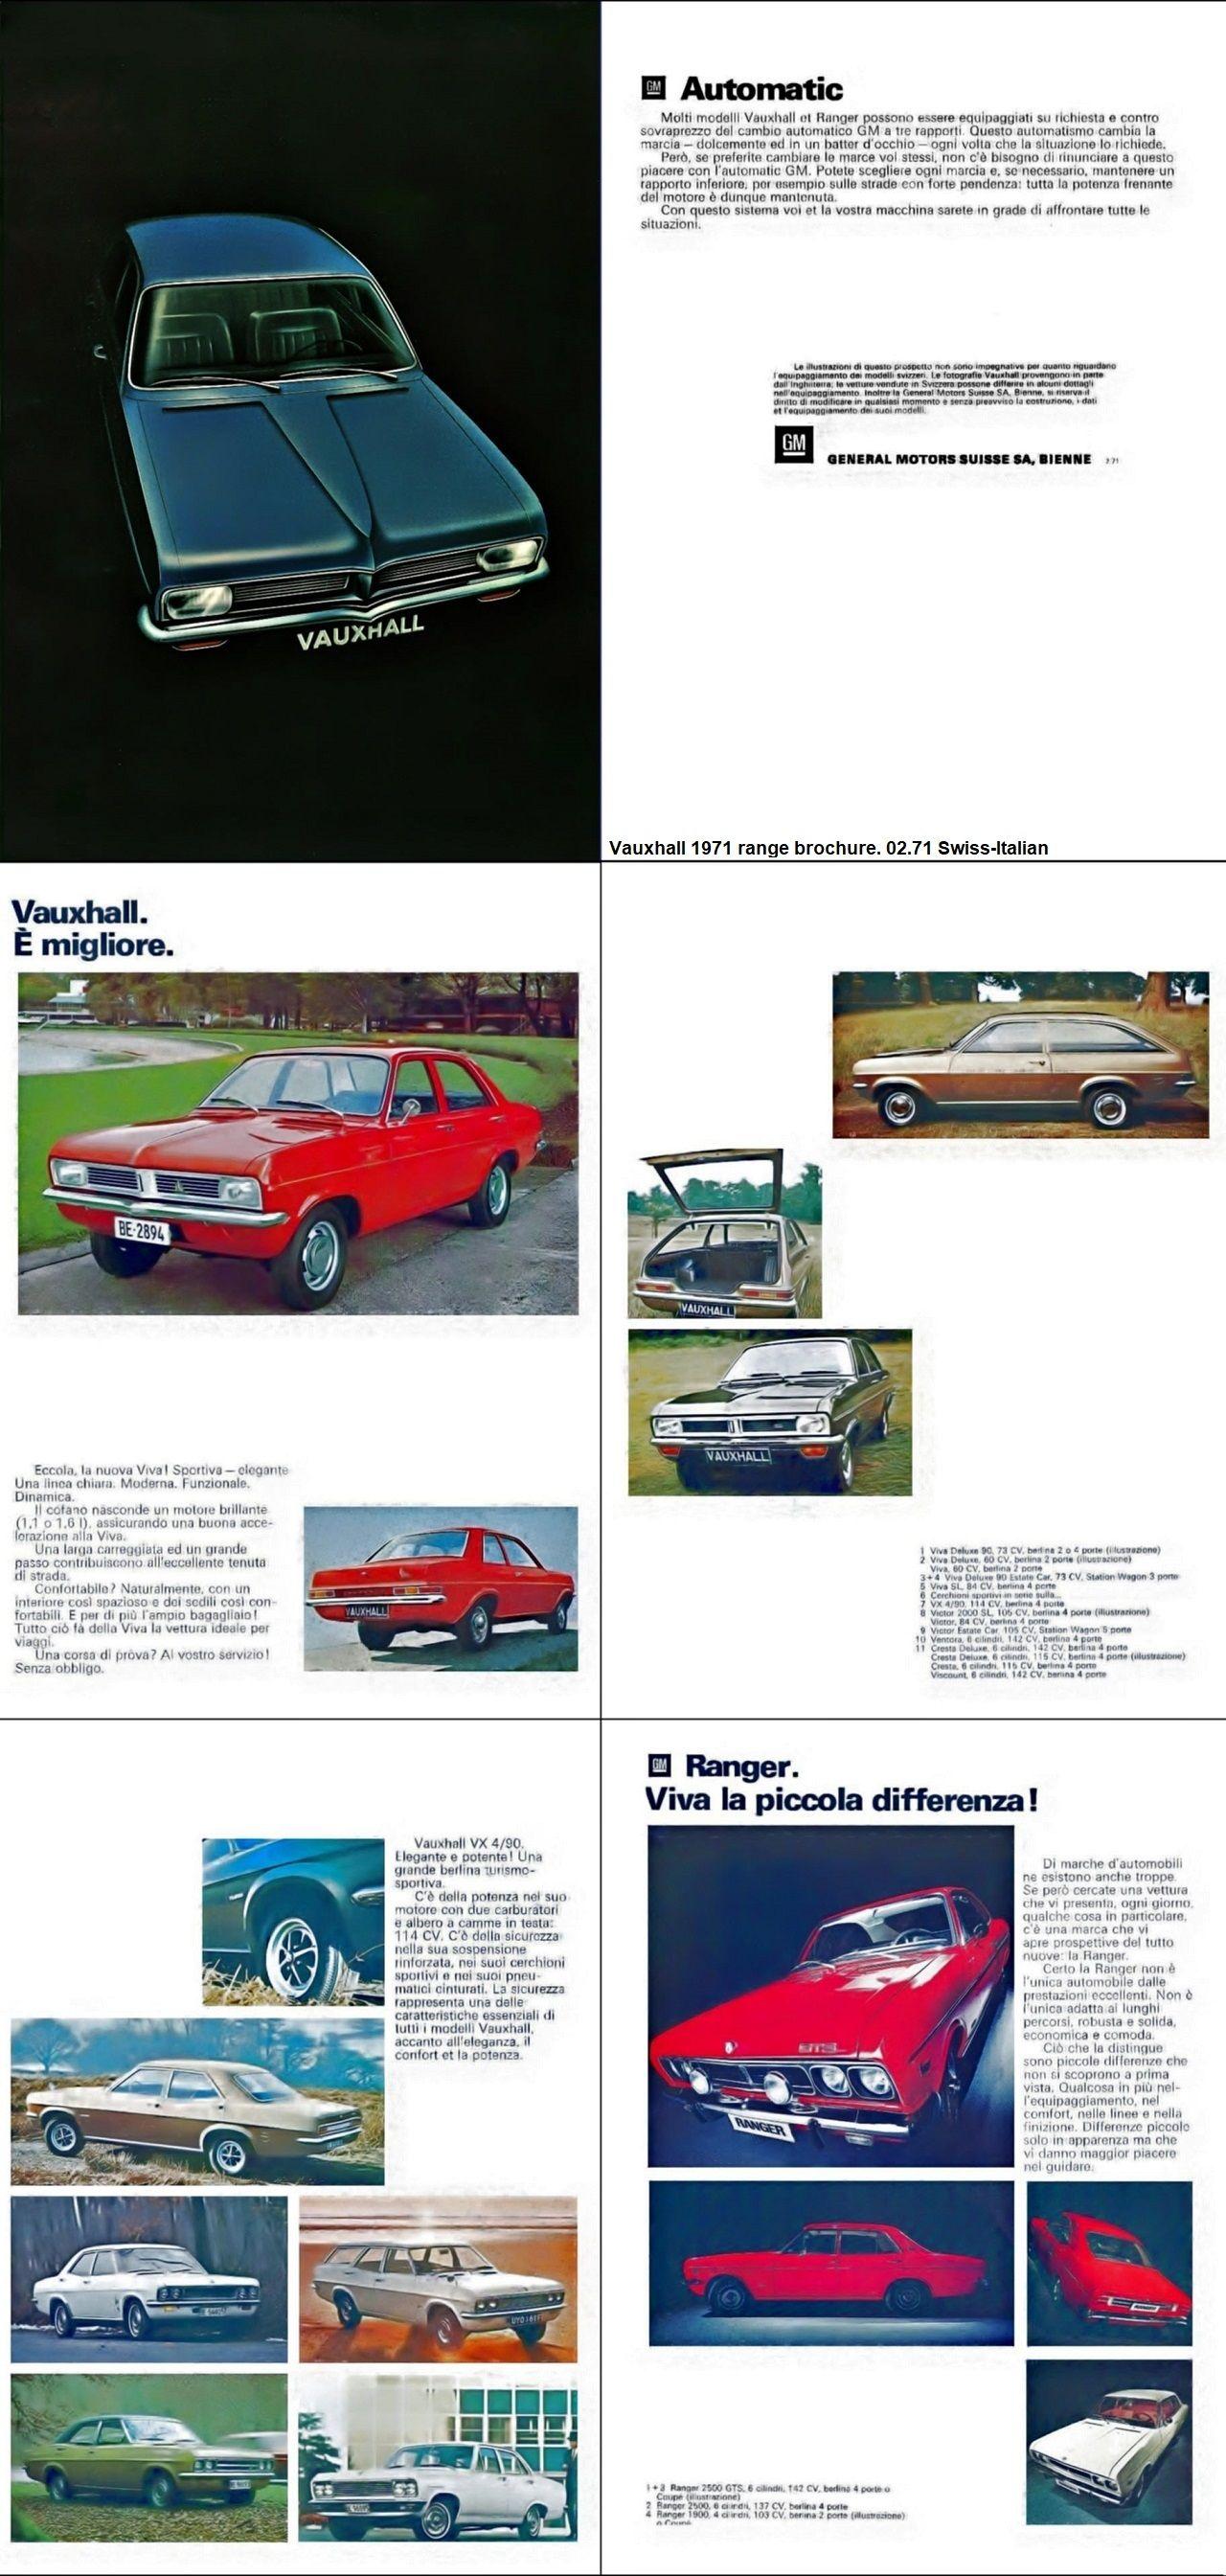 Pin By Vauxpedia On Vauxhall Hc Viva Brochures Export Markets Pinterest Marketing